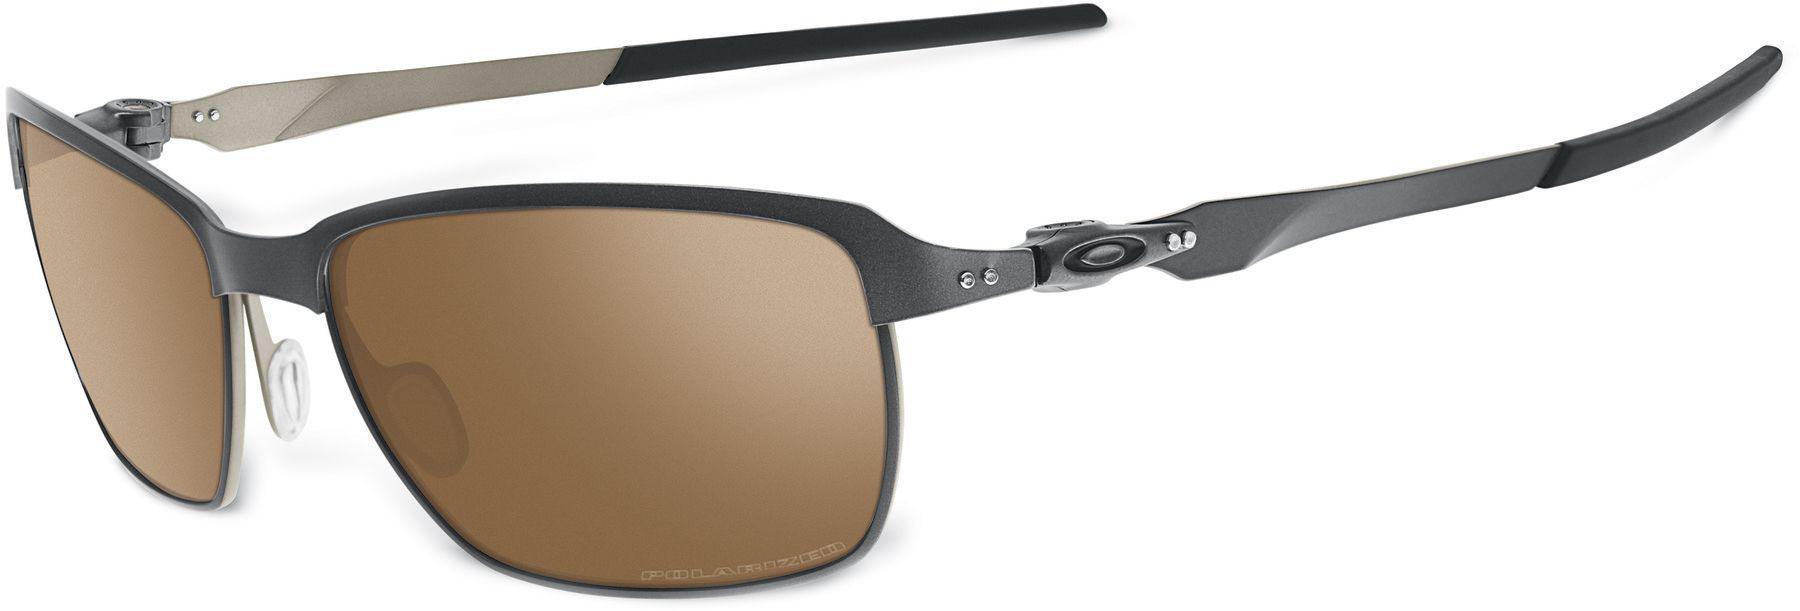 e81dbae4aa7 Lyst - Oakley Tinfoil Polarized Sunglasses for Men